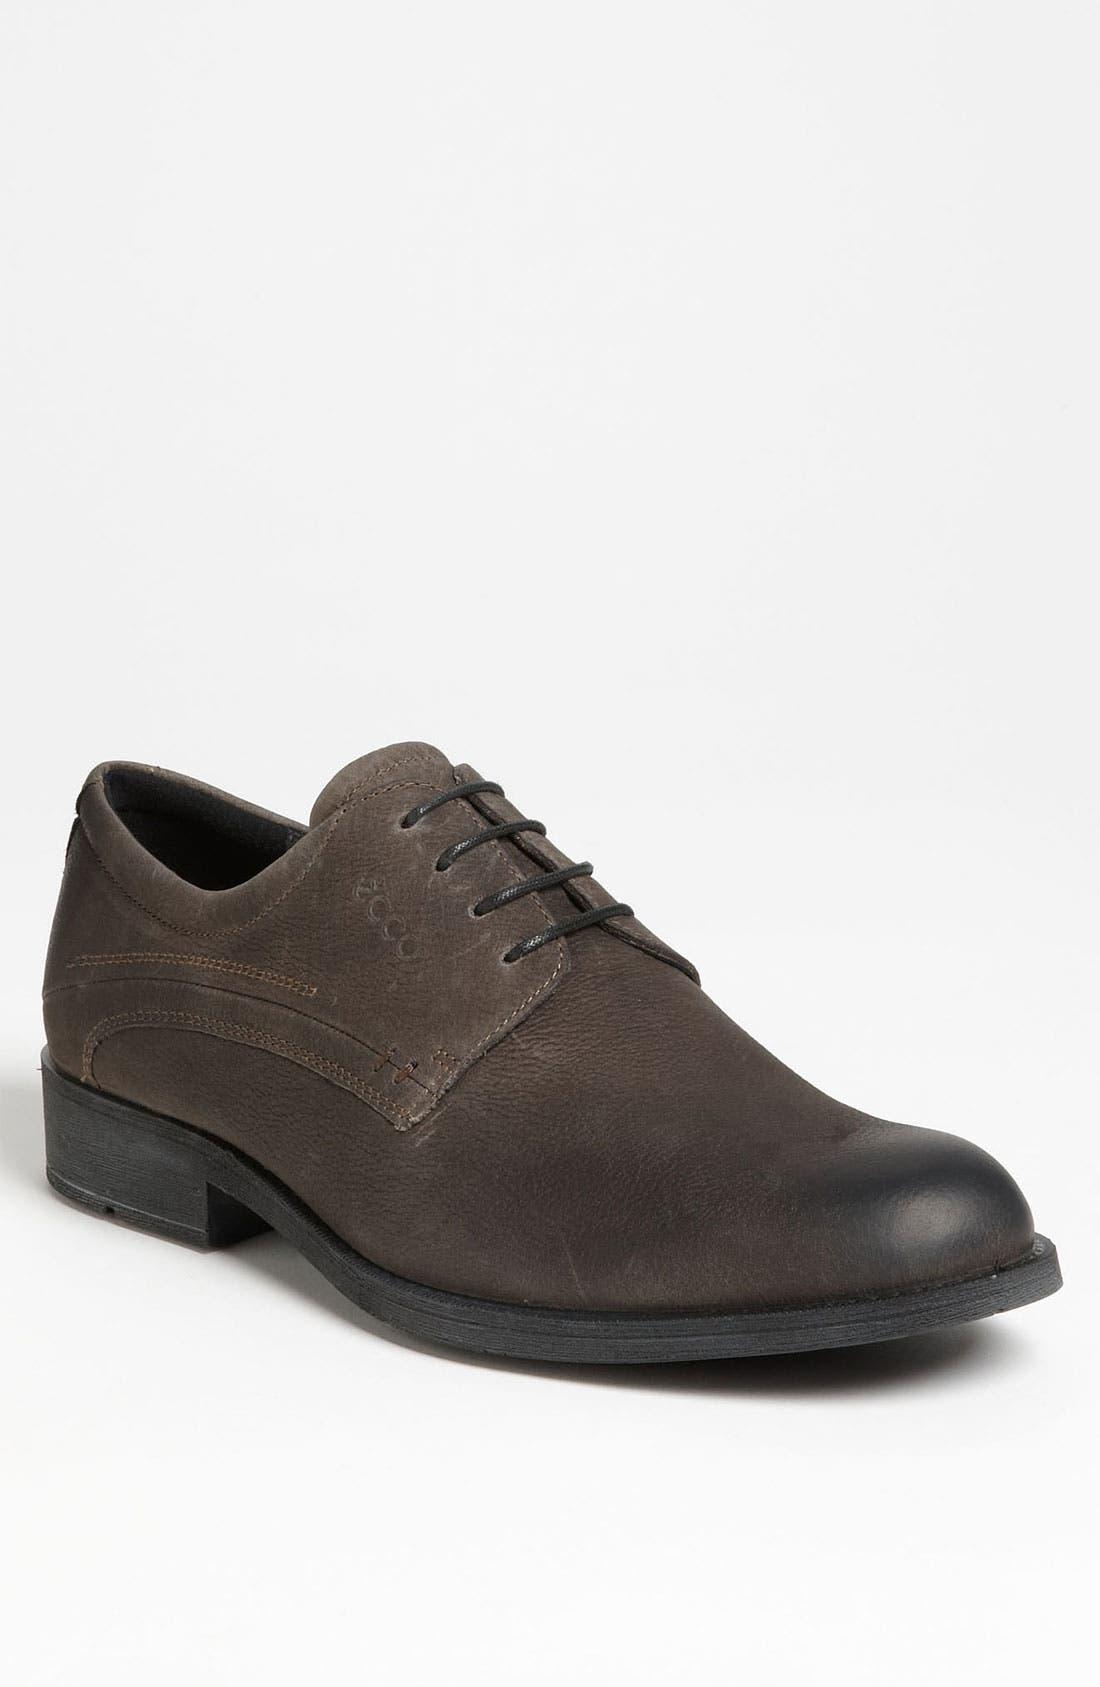 Alternate Image 1 Selected - ECCO 'Birmingham' Buck Shoe